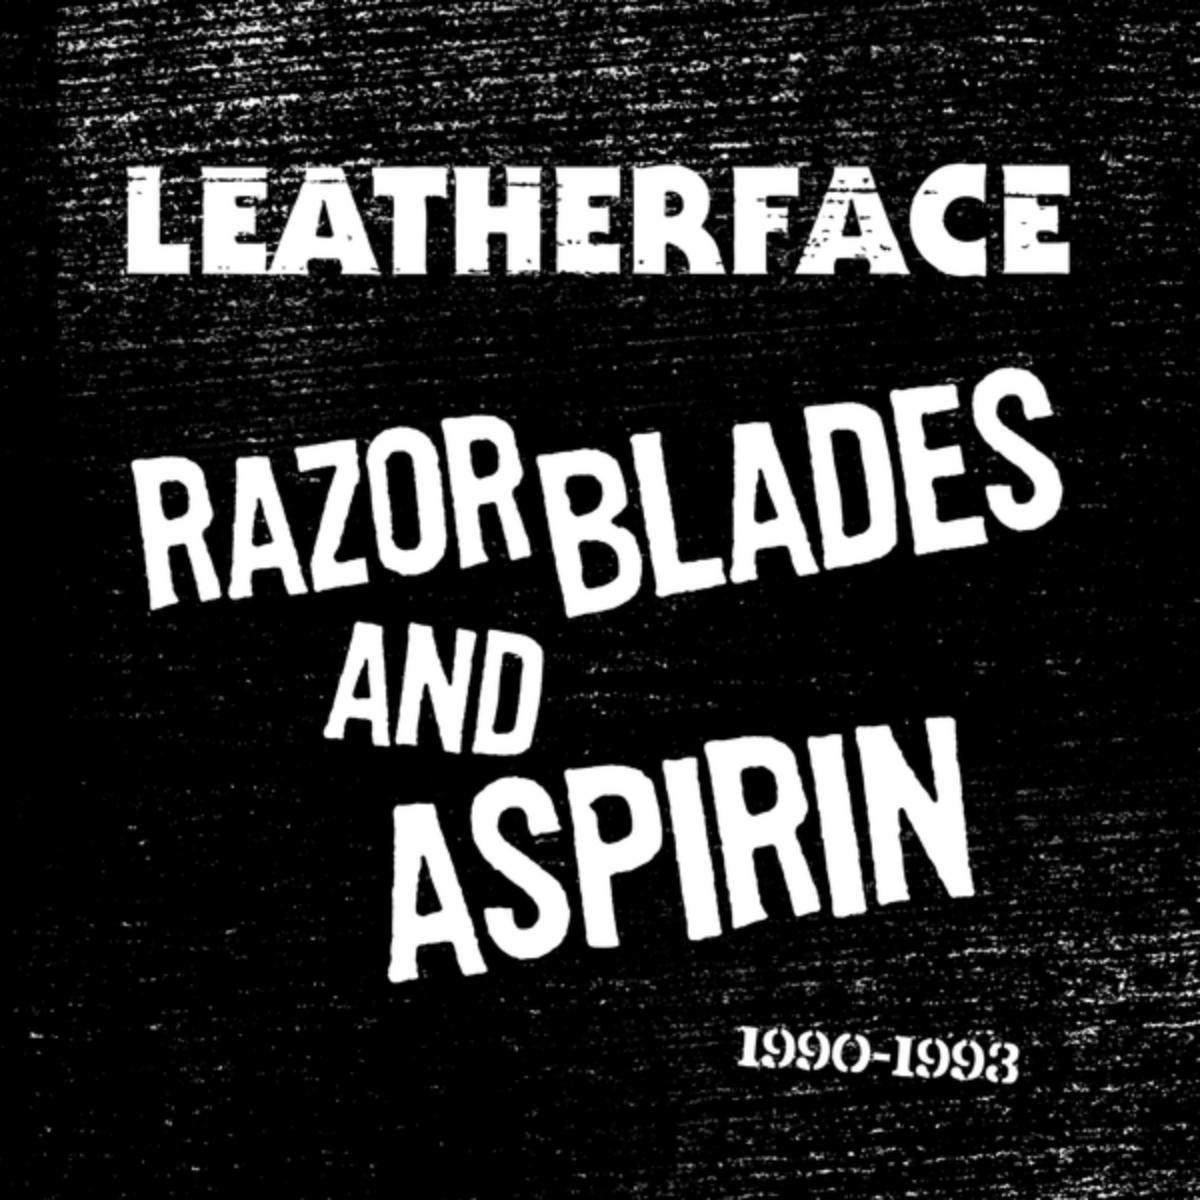 Leatherface – Razor Blades And Aspirin: 1990-1993 (2015) [FLAC]